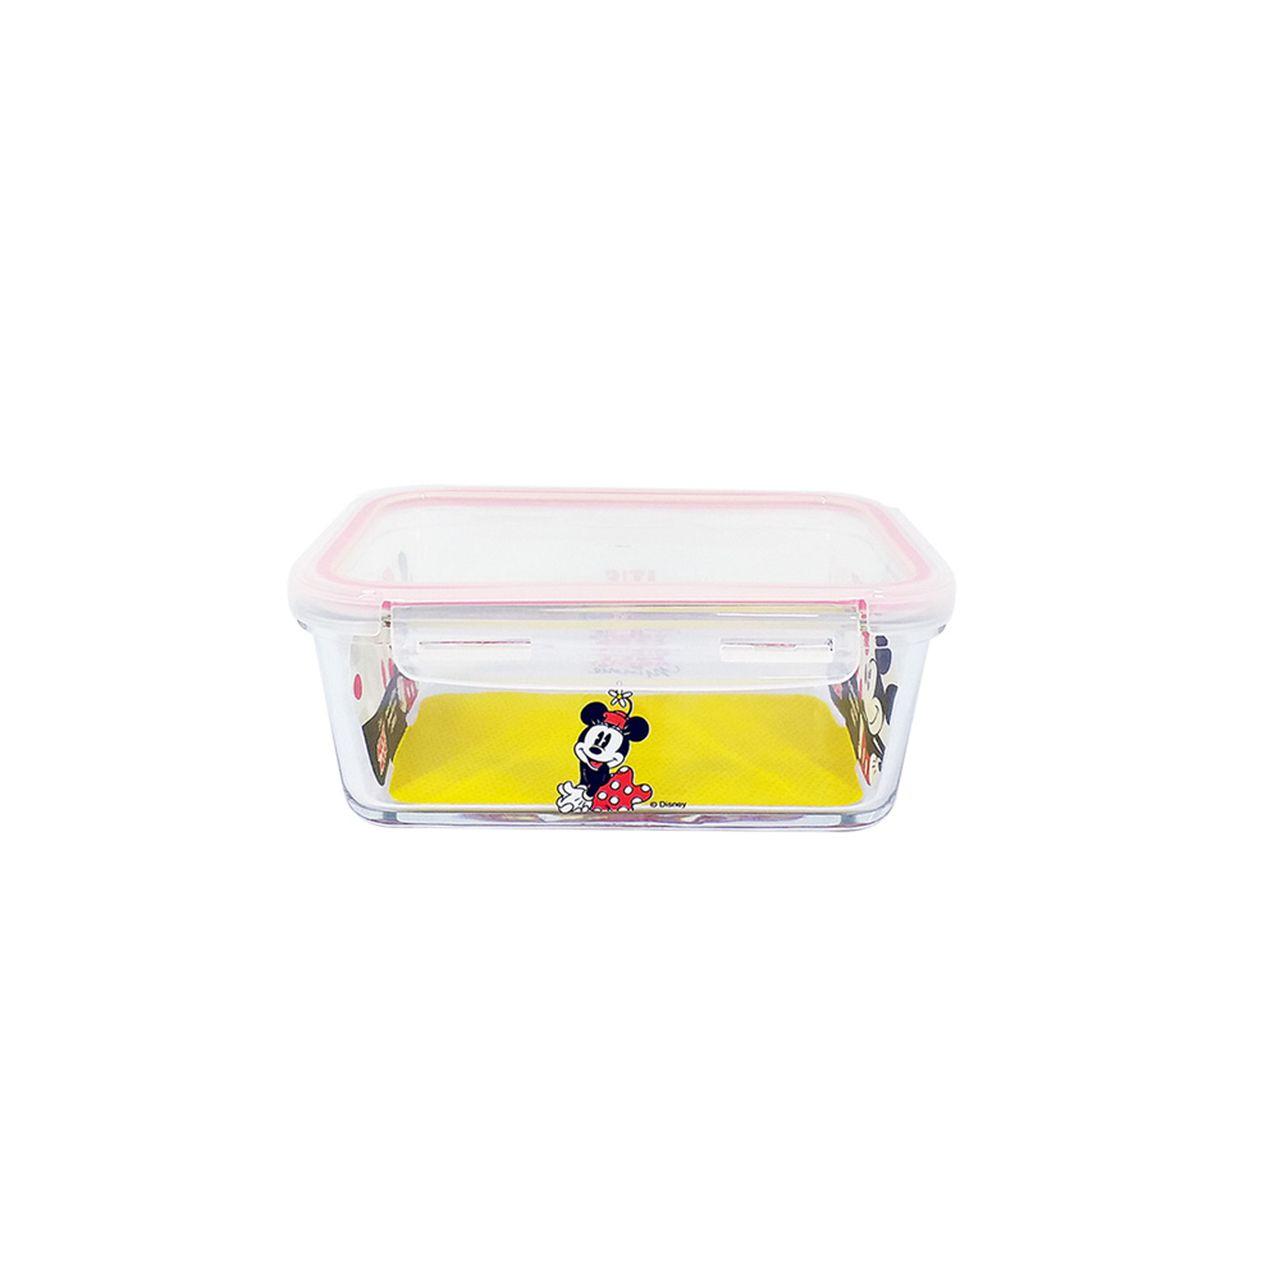 Pote de Vidro Com Tampa e Trava (400ml): Minnie Mouse - Disney